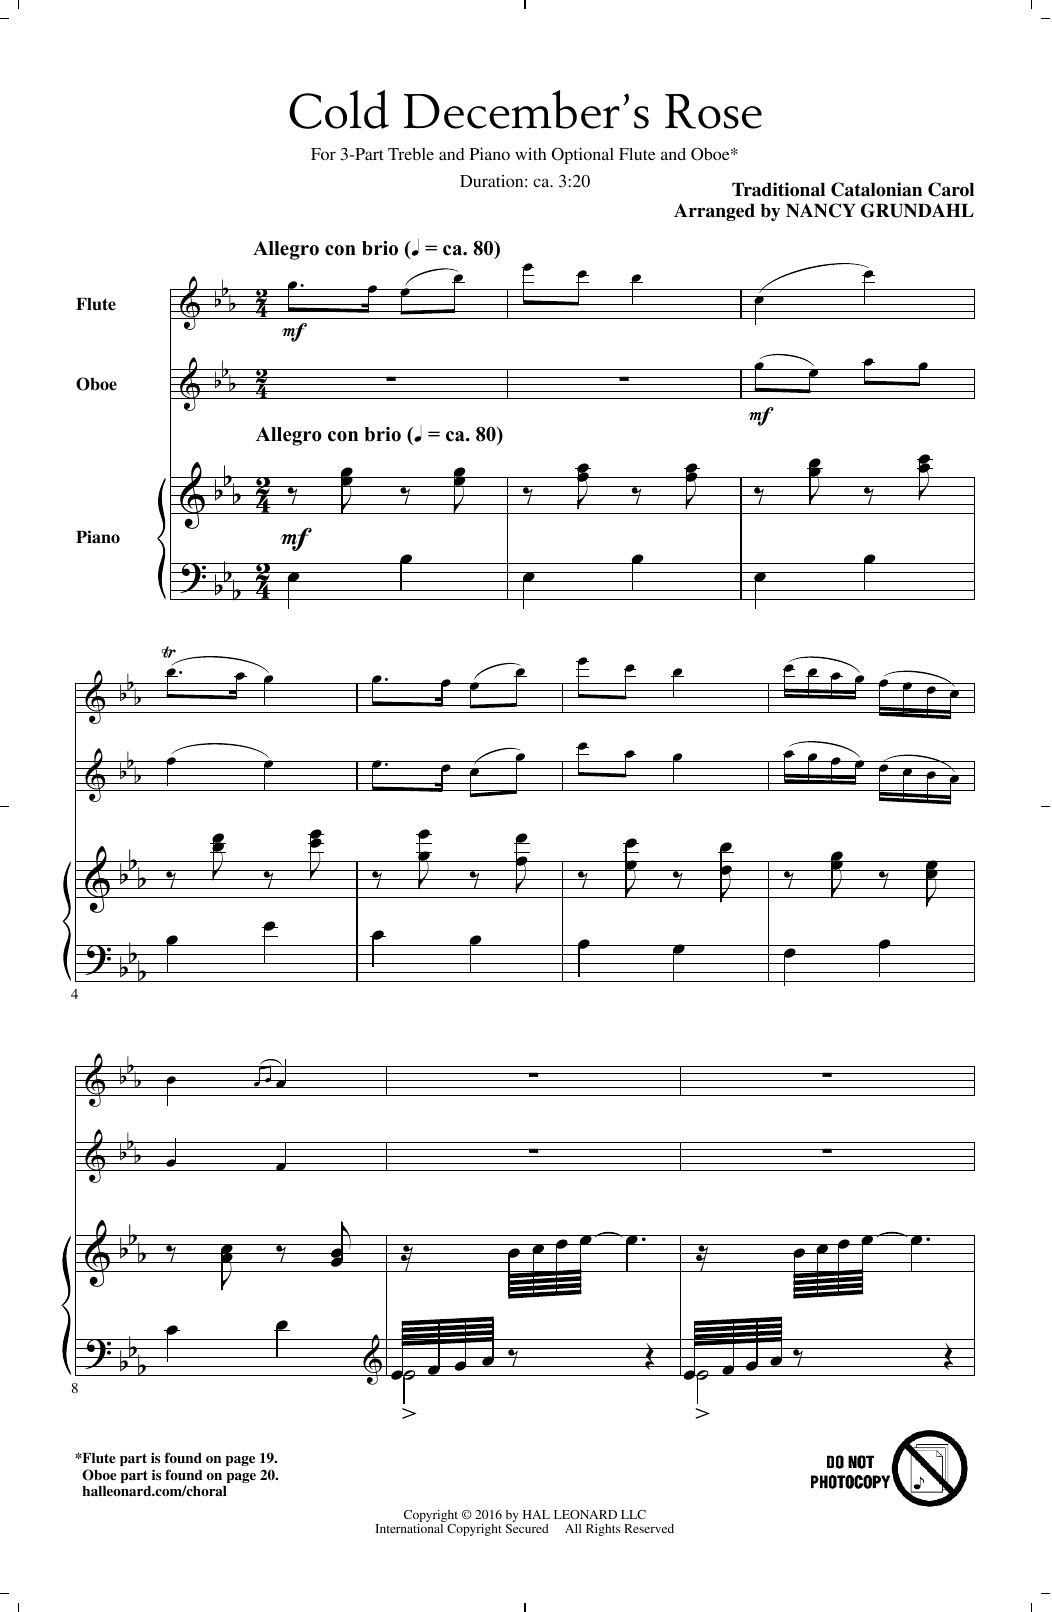 Cold December's Rose (arr. Nancy Grundahl) (3-Part Treble Choir)